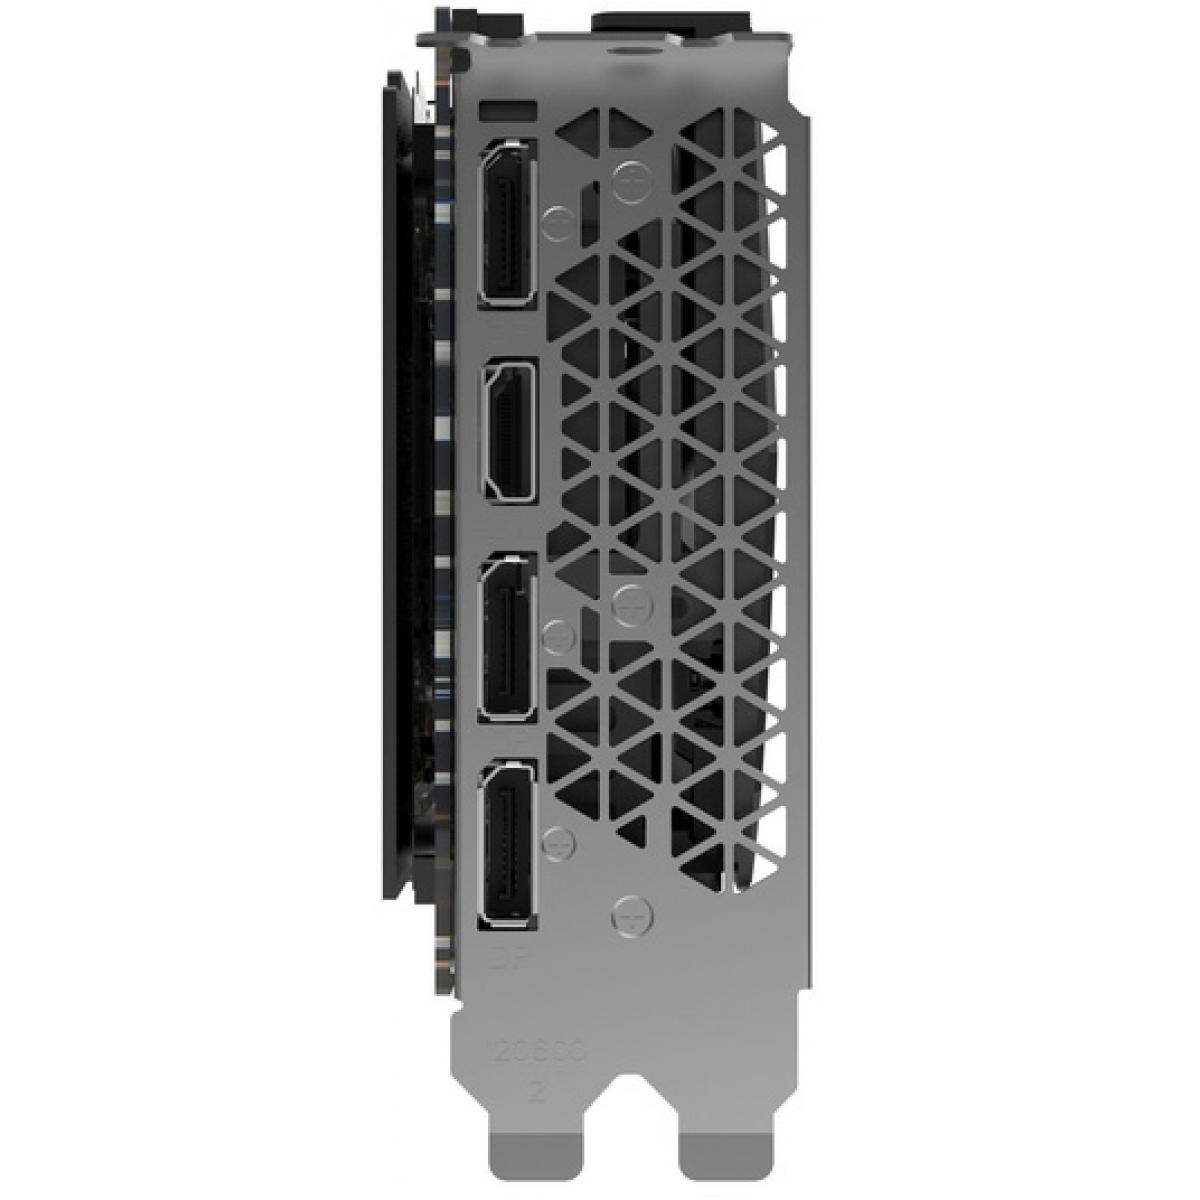 Placa de Vídeo Zotac GeForce RTX 2070 Super Gaming Twin Fan, 8GB GDDR6, 256Bit